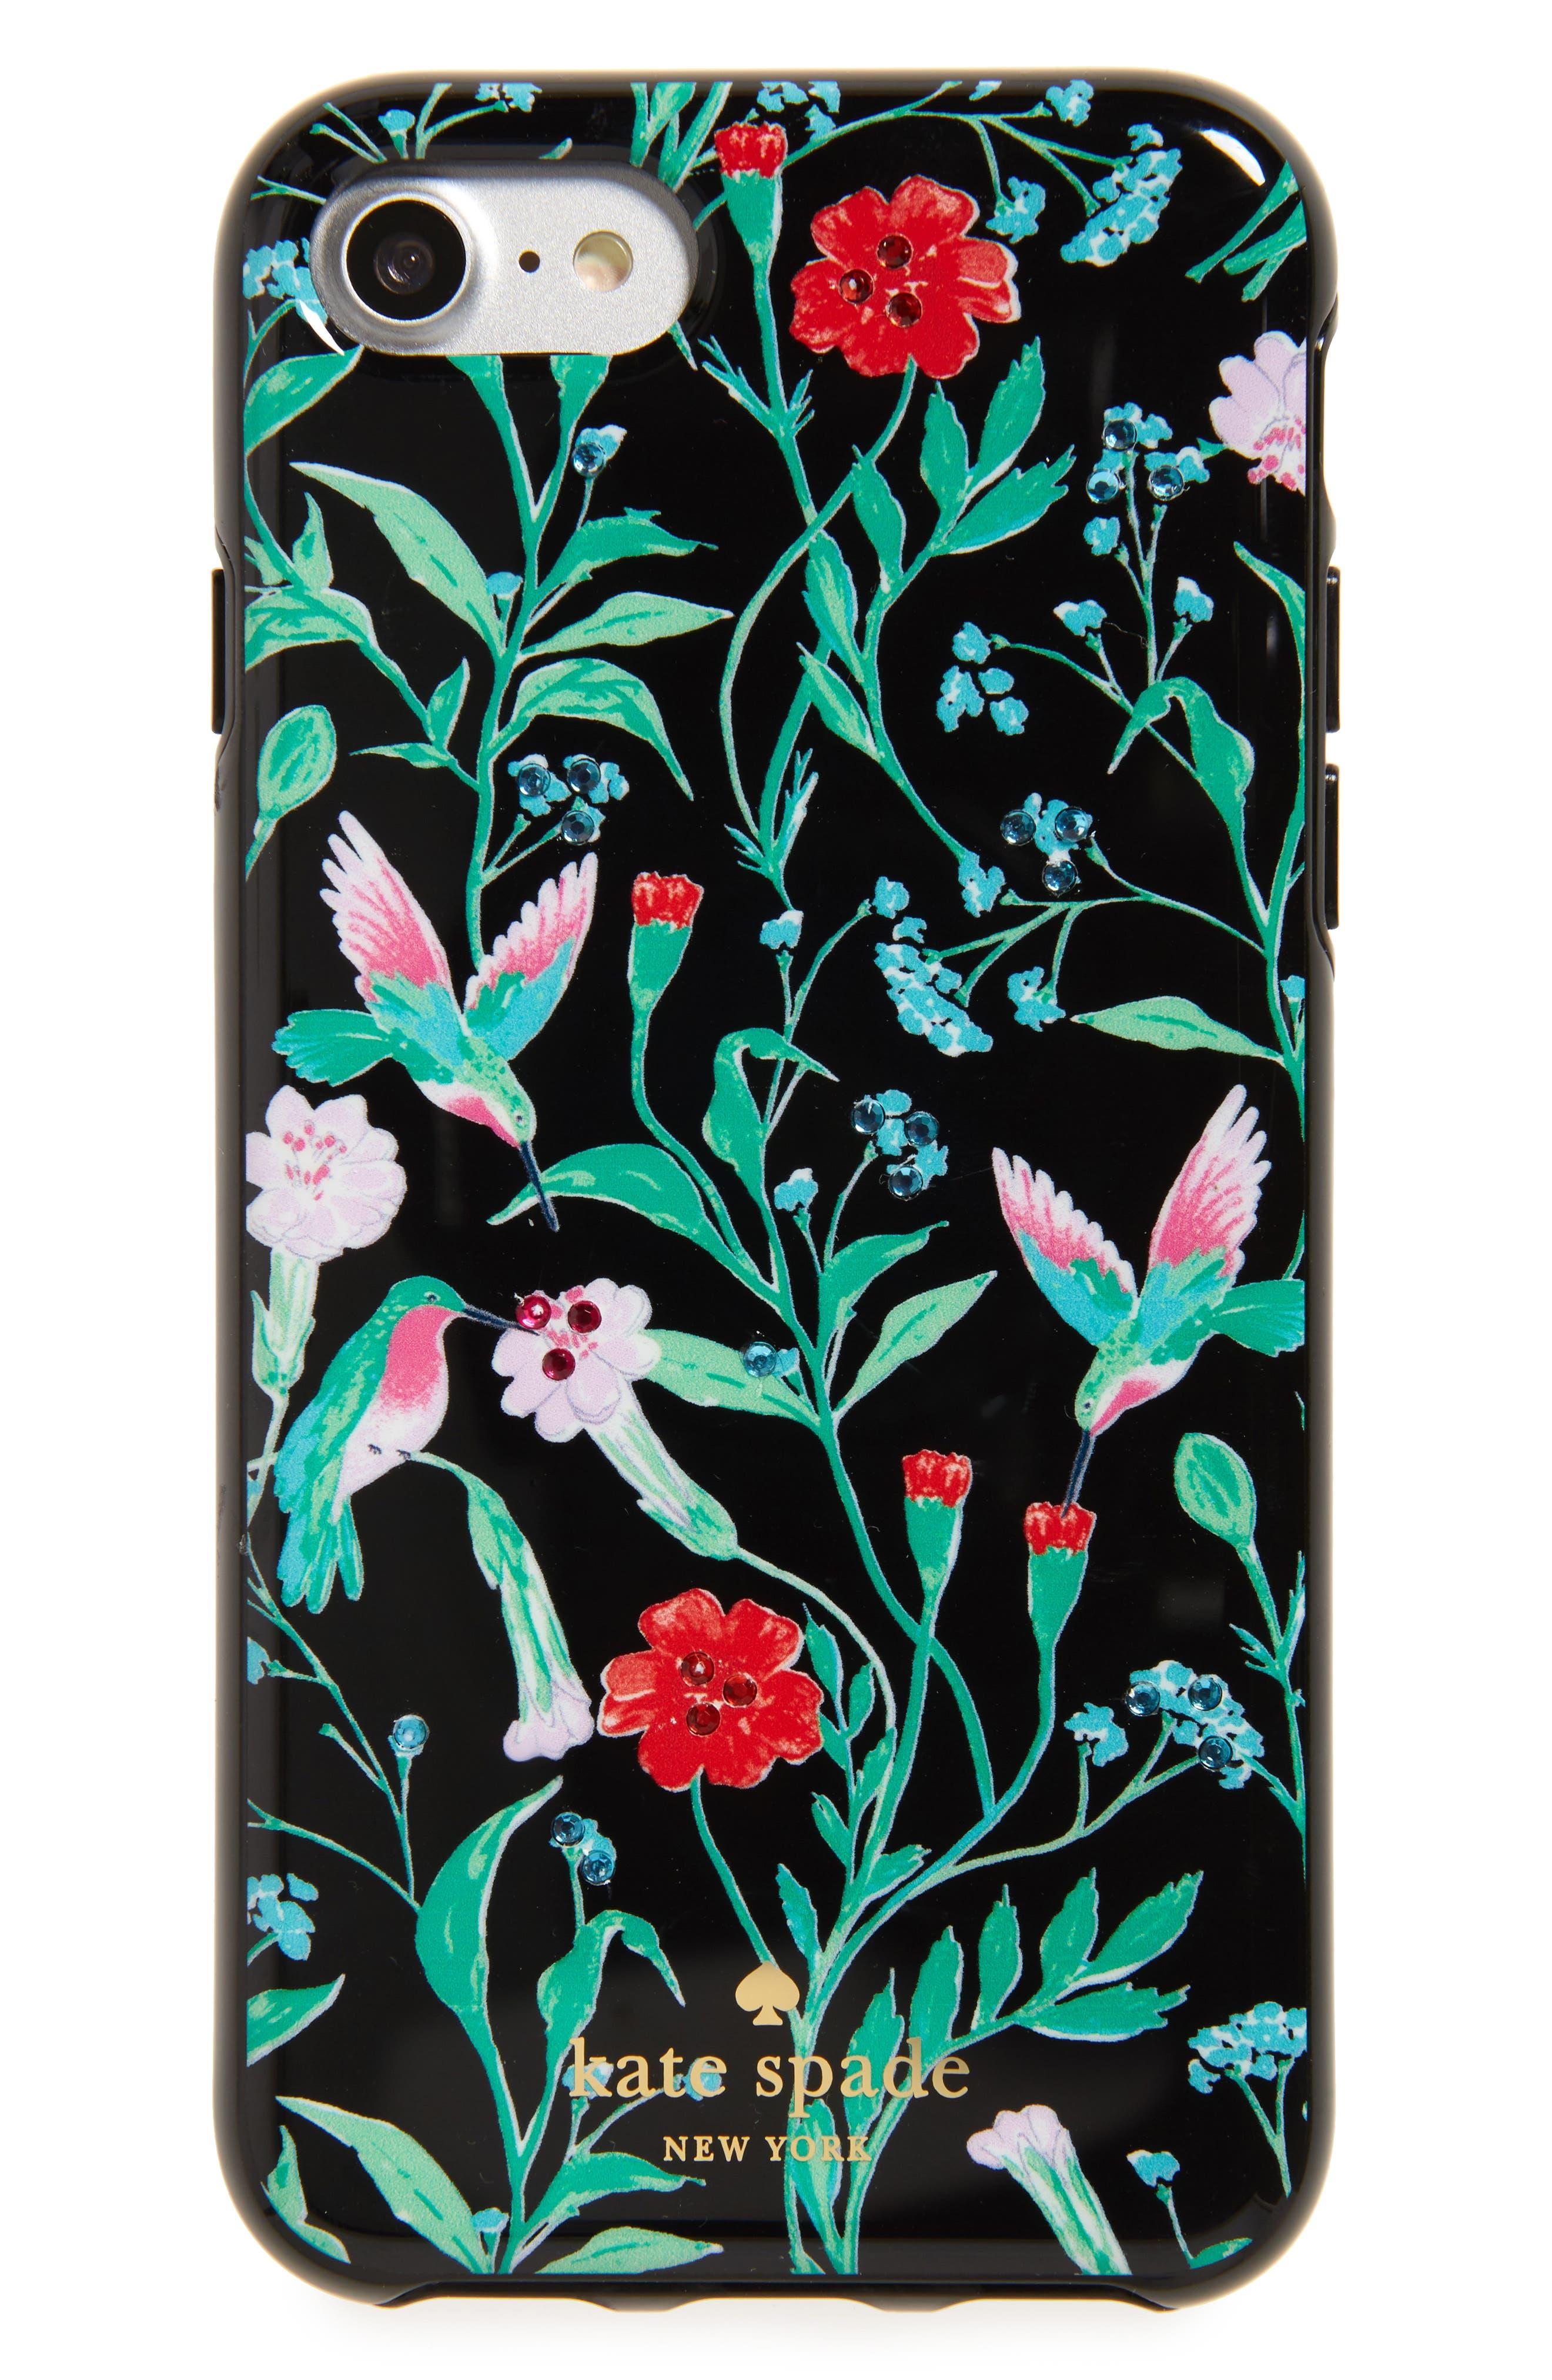 kate spade new york jeweled jardin iPhone 7 & 7 Plus case